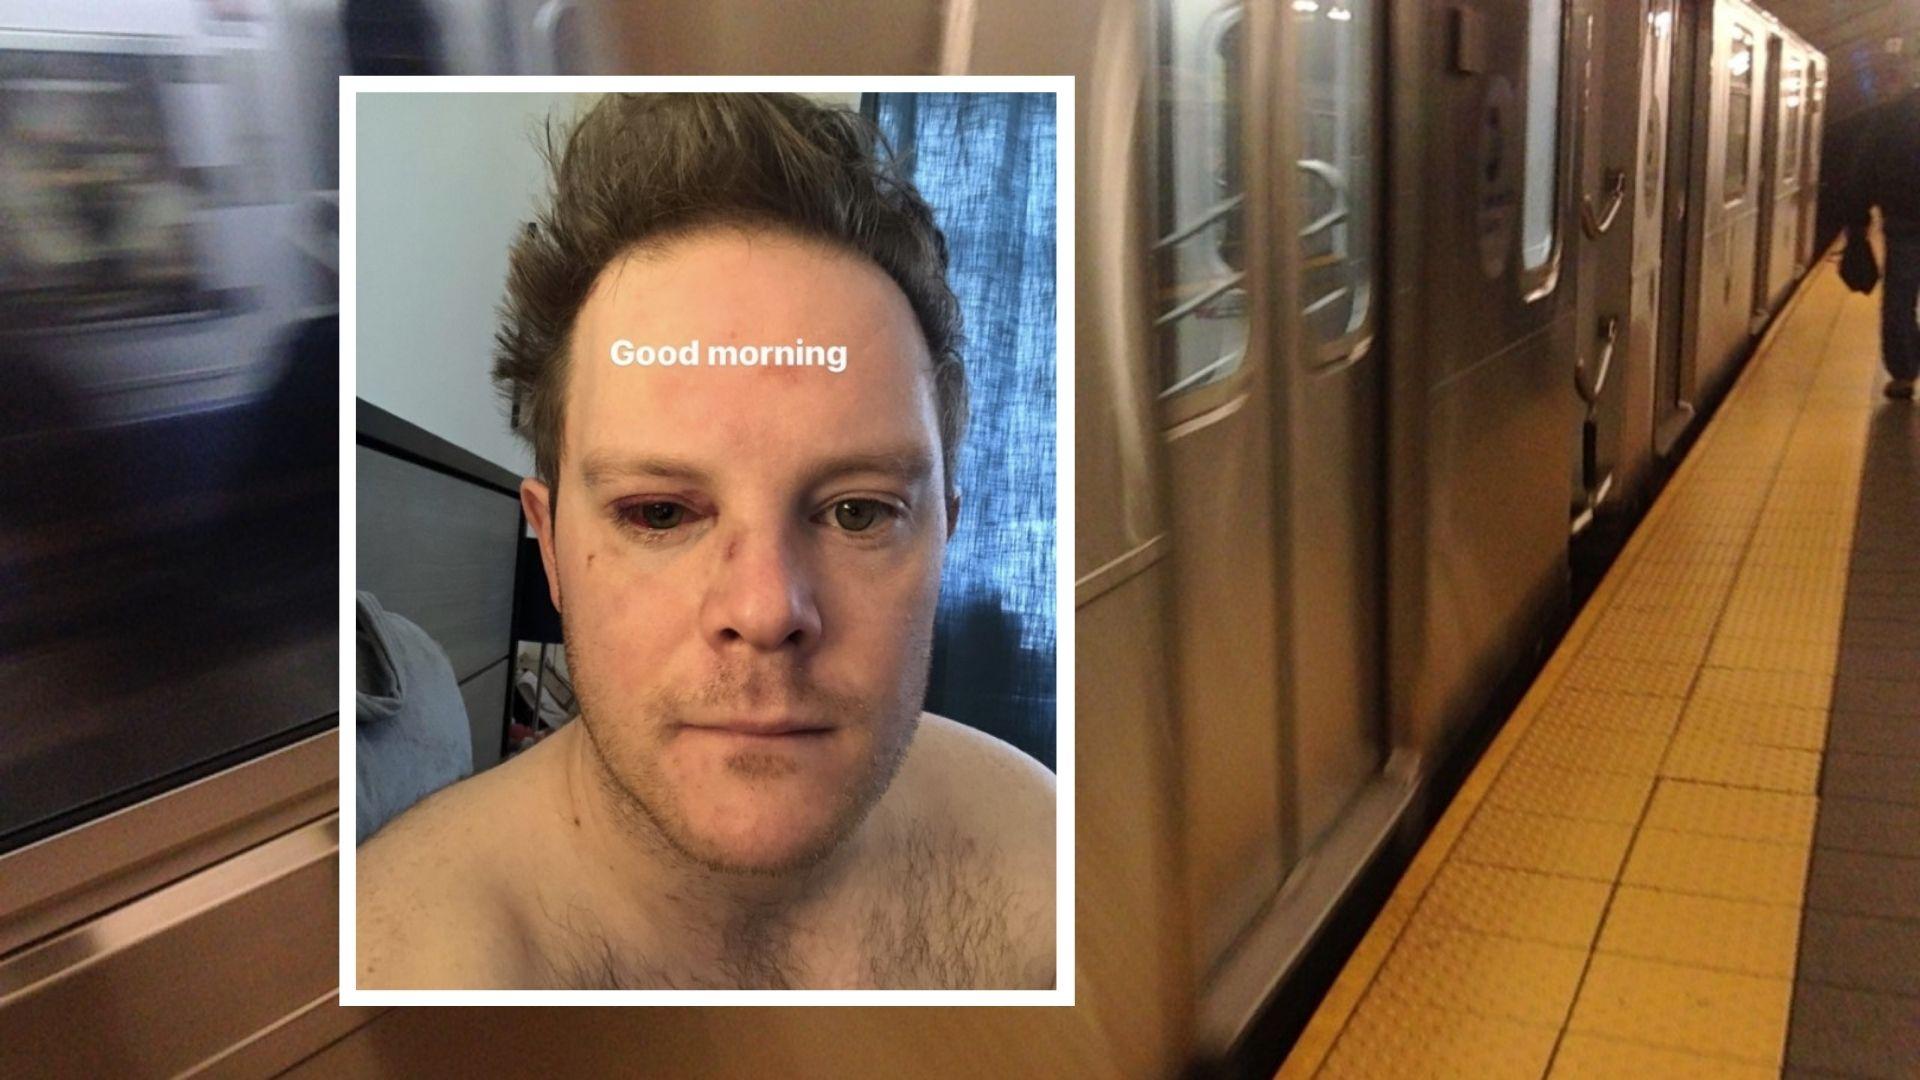 Broadway actor Alex Weisman attacked in Upper West Side subway station